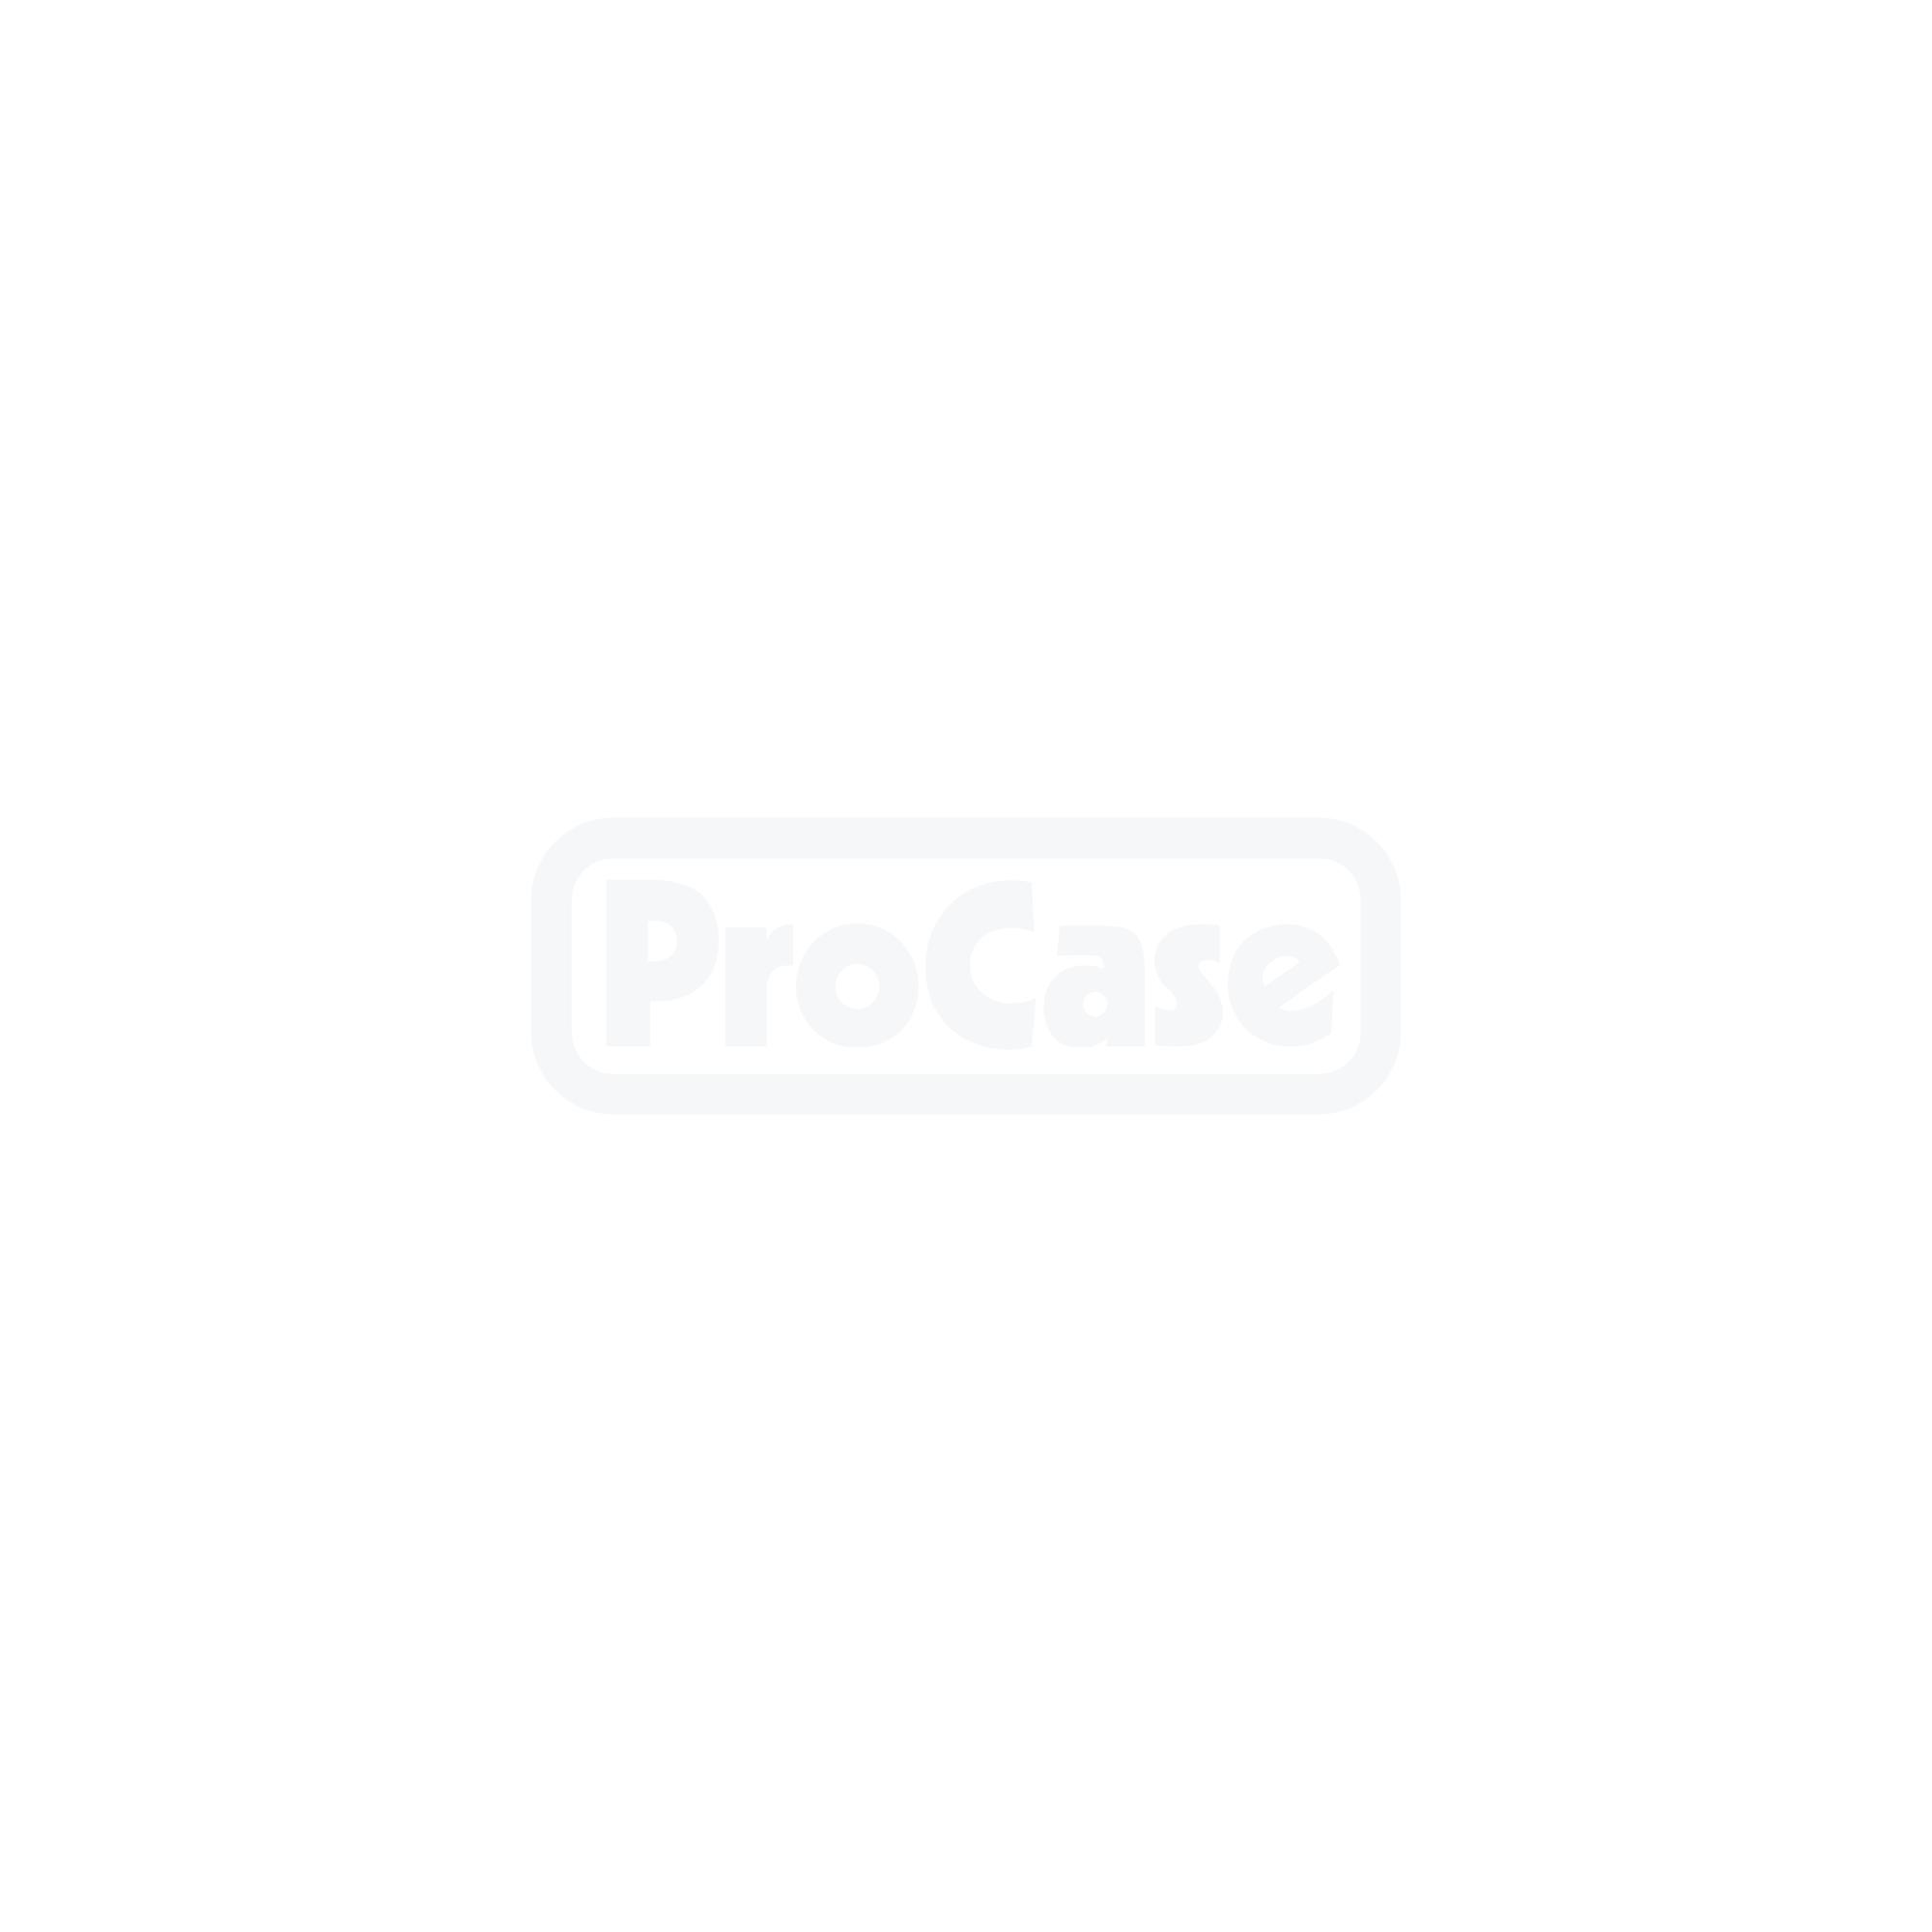 Flightcase für Panasonic TH-65PF 9EK, 10EK, 11EK, 12EK